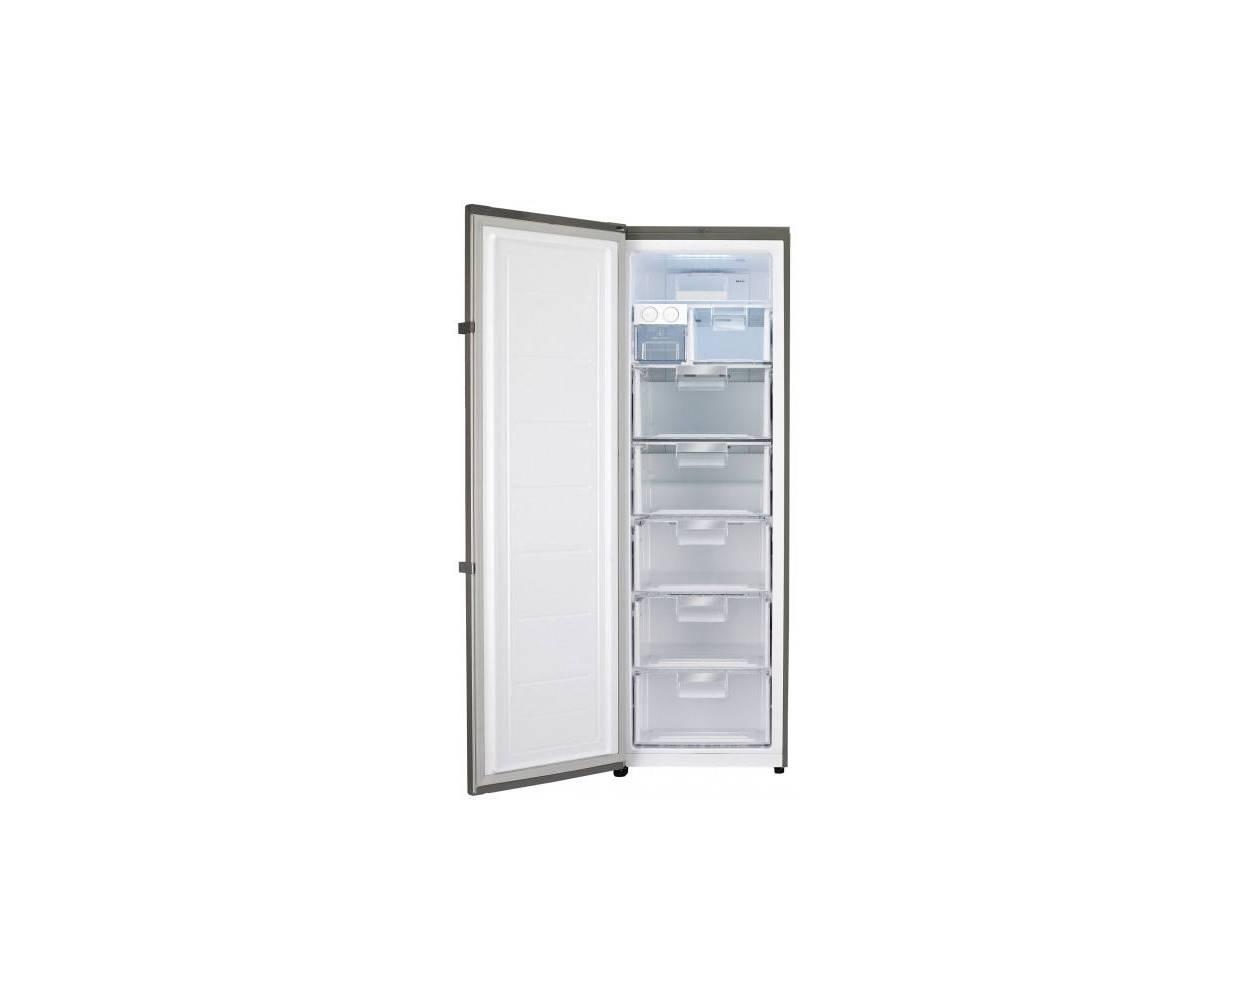 LG Standing Freezer FRZ 404